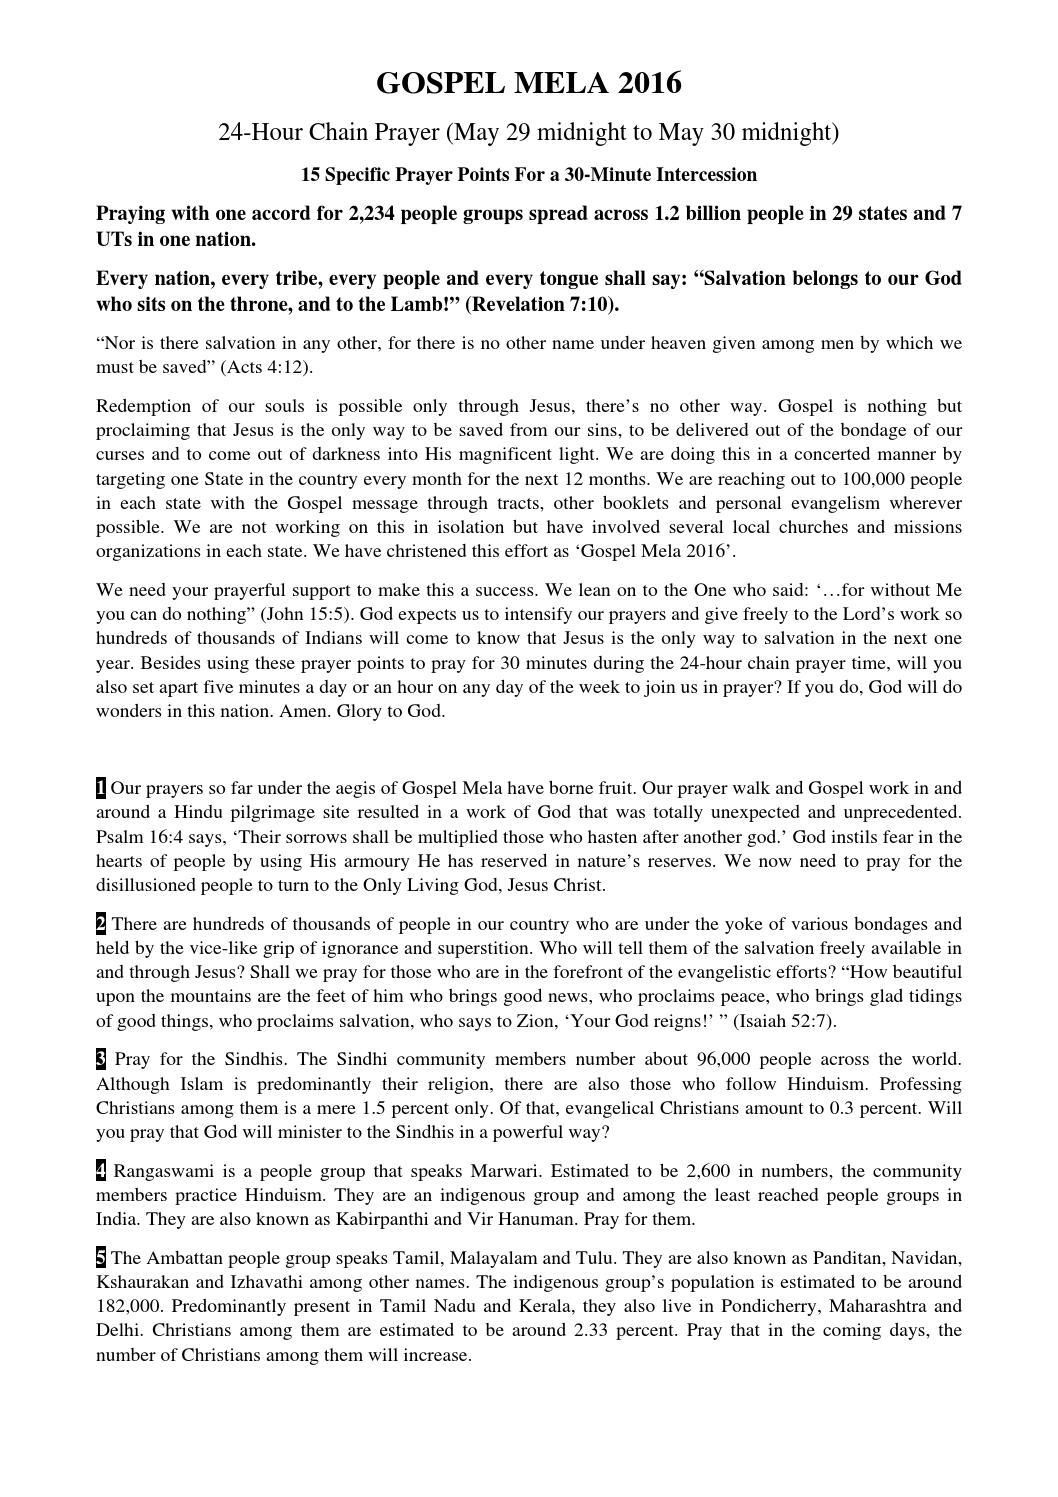 Gospel Mela 2016: Prayer Points in English by Christian